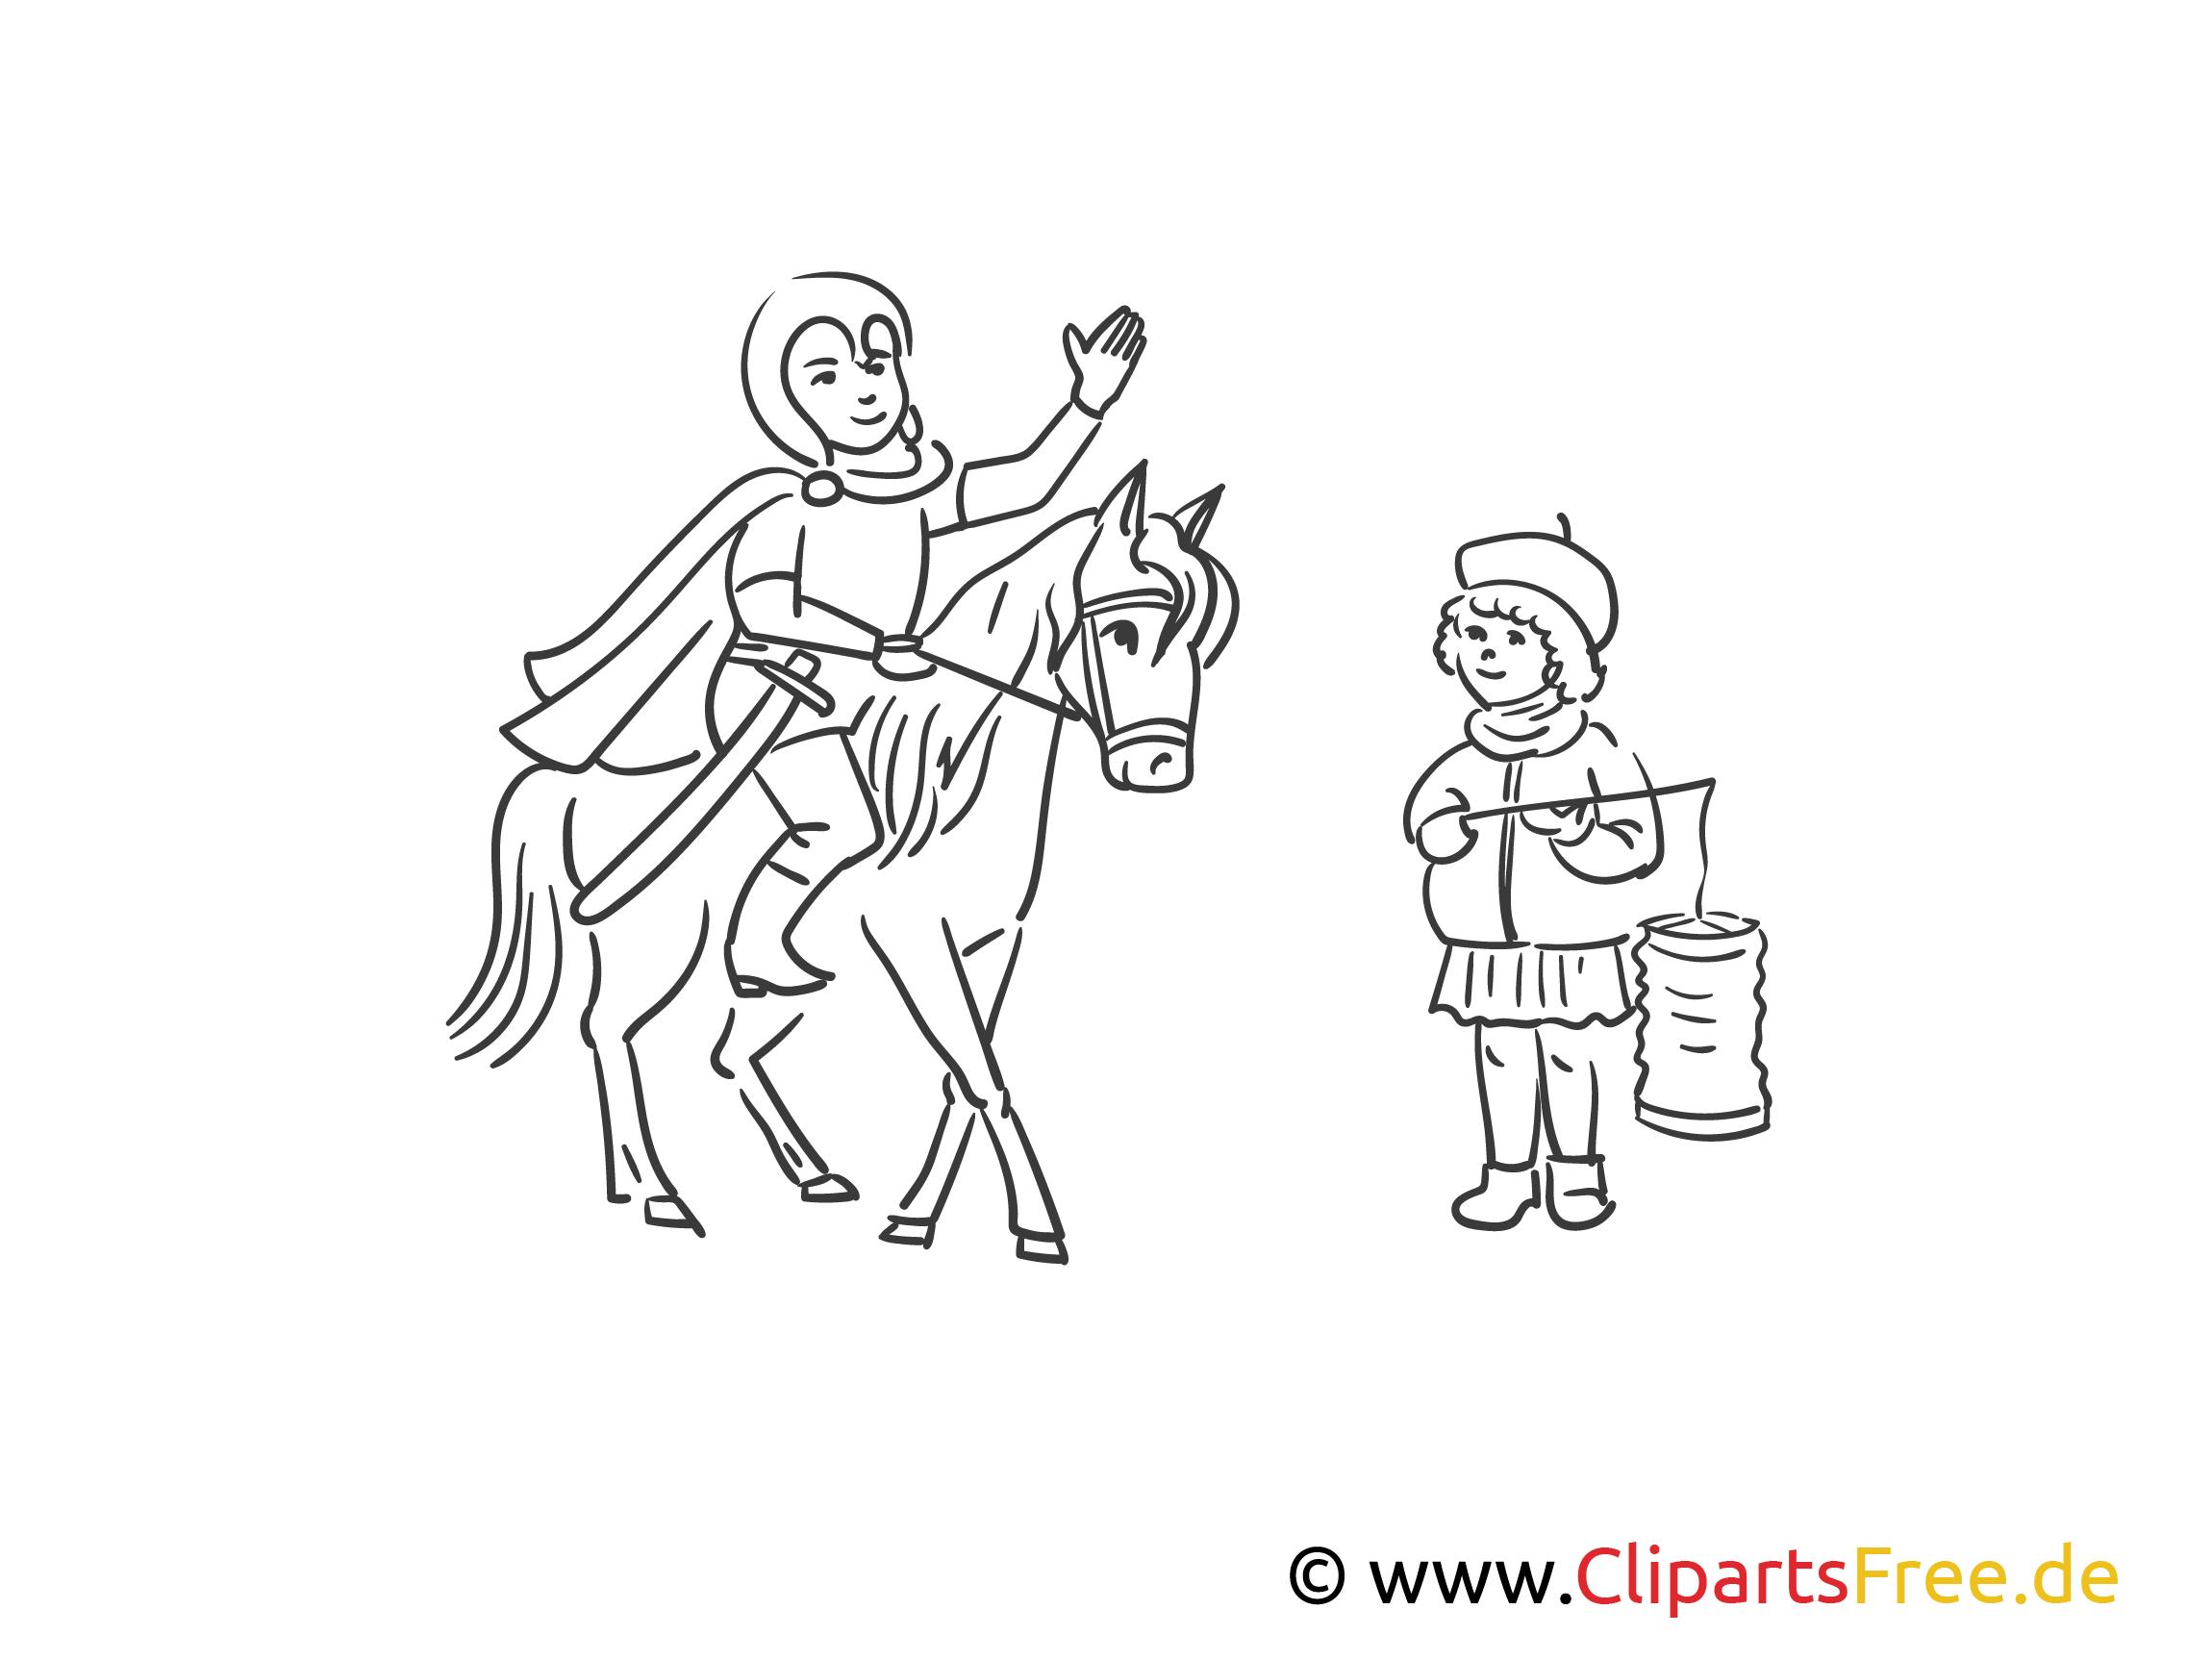 Malvorlage Sankt Martin Pferd  Coloring and Malvorlagan